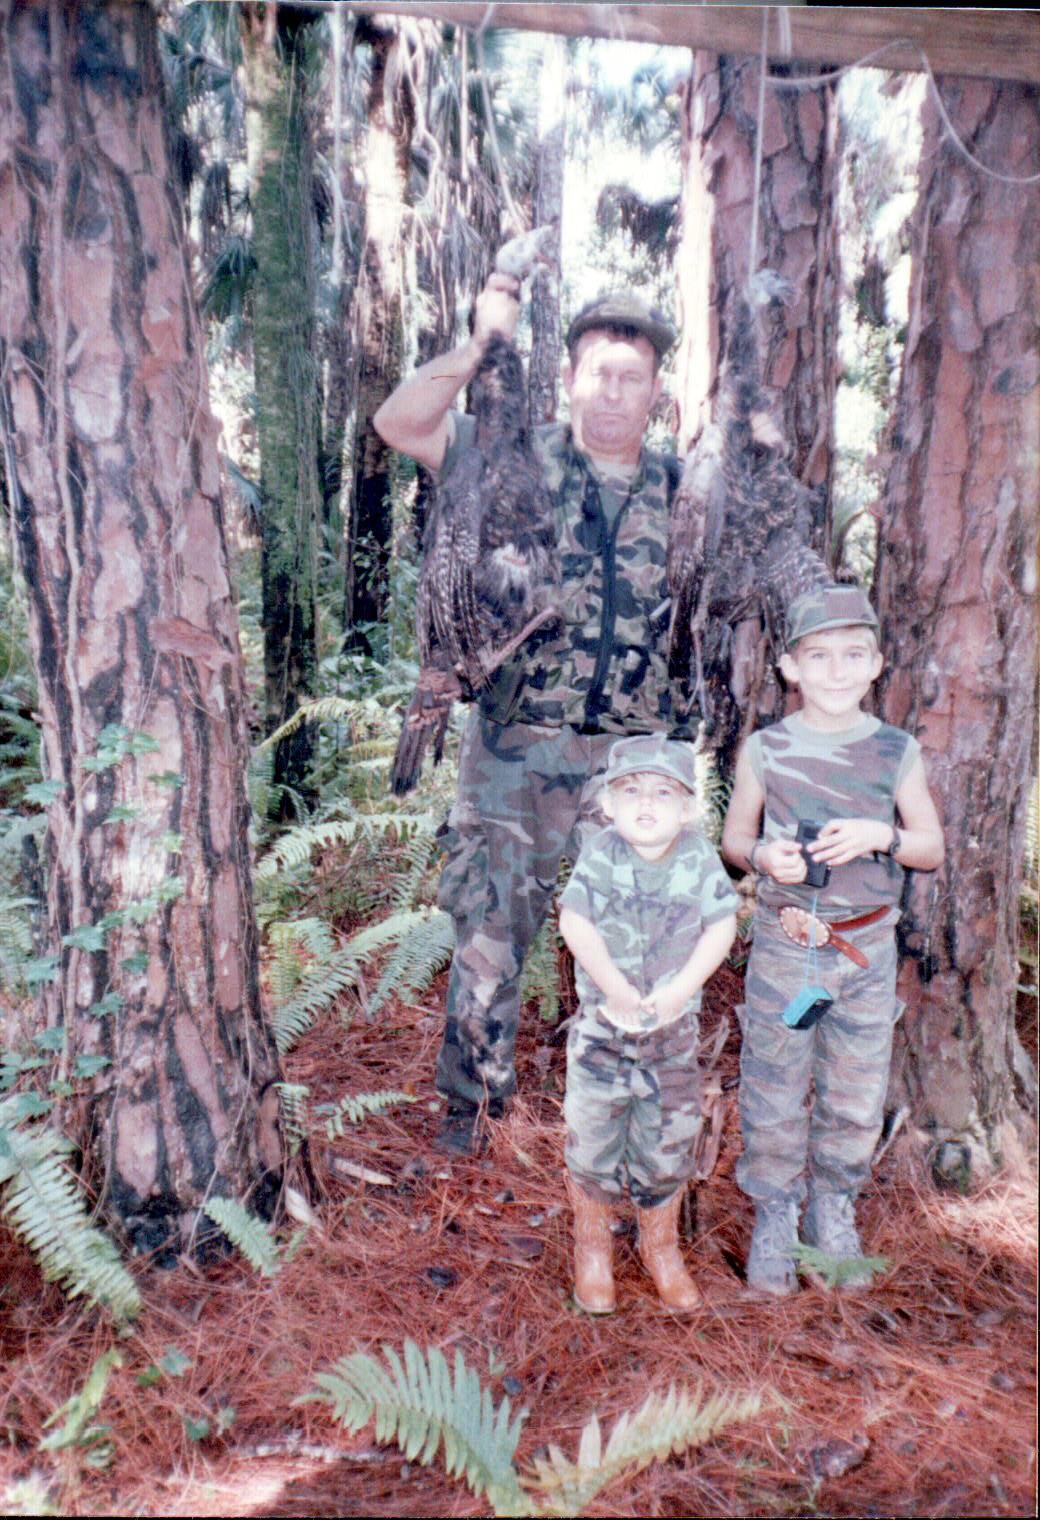 Hunting Osceola Turkeys in South Florida with Dad & my bro.